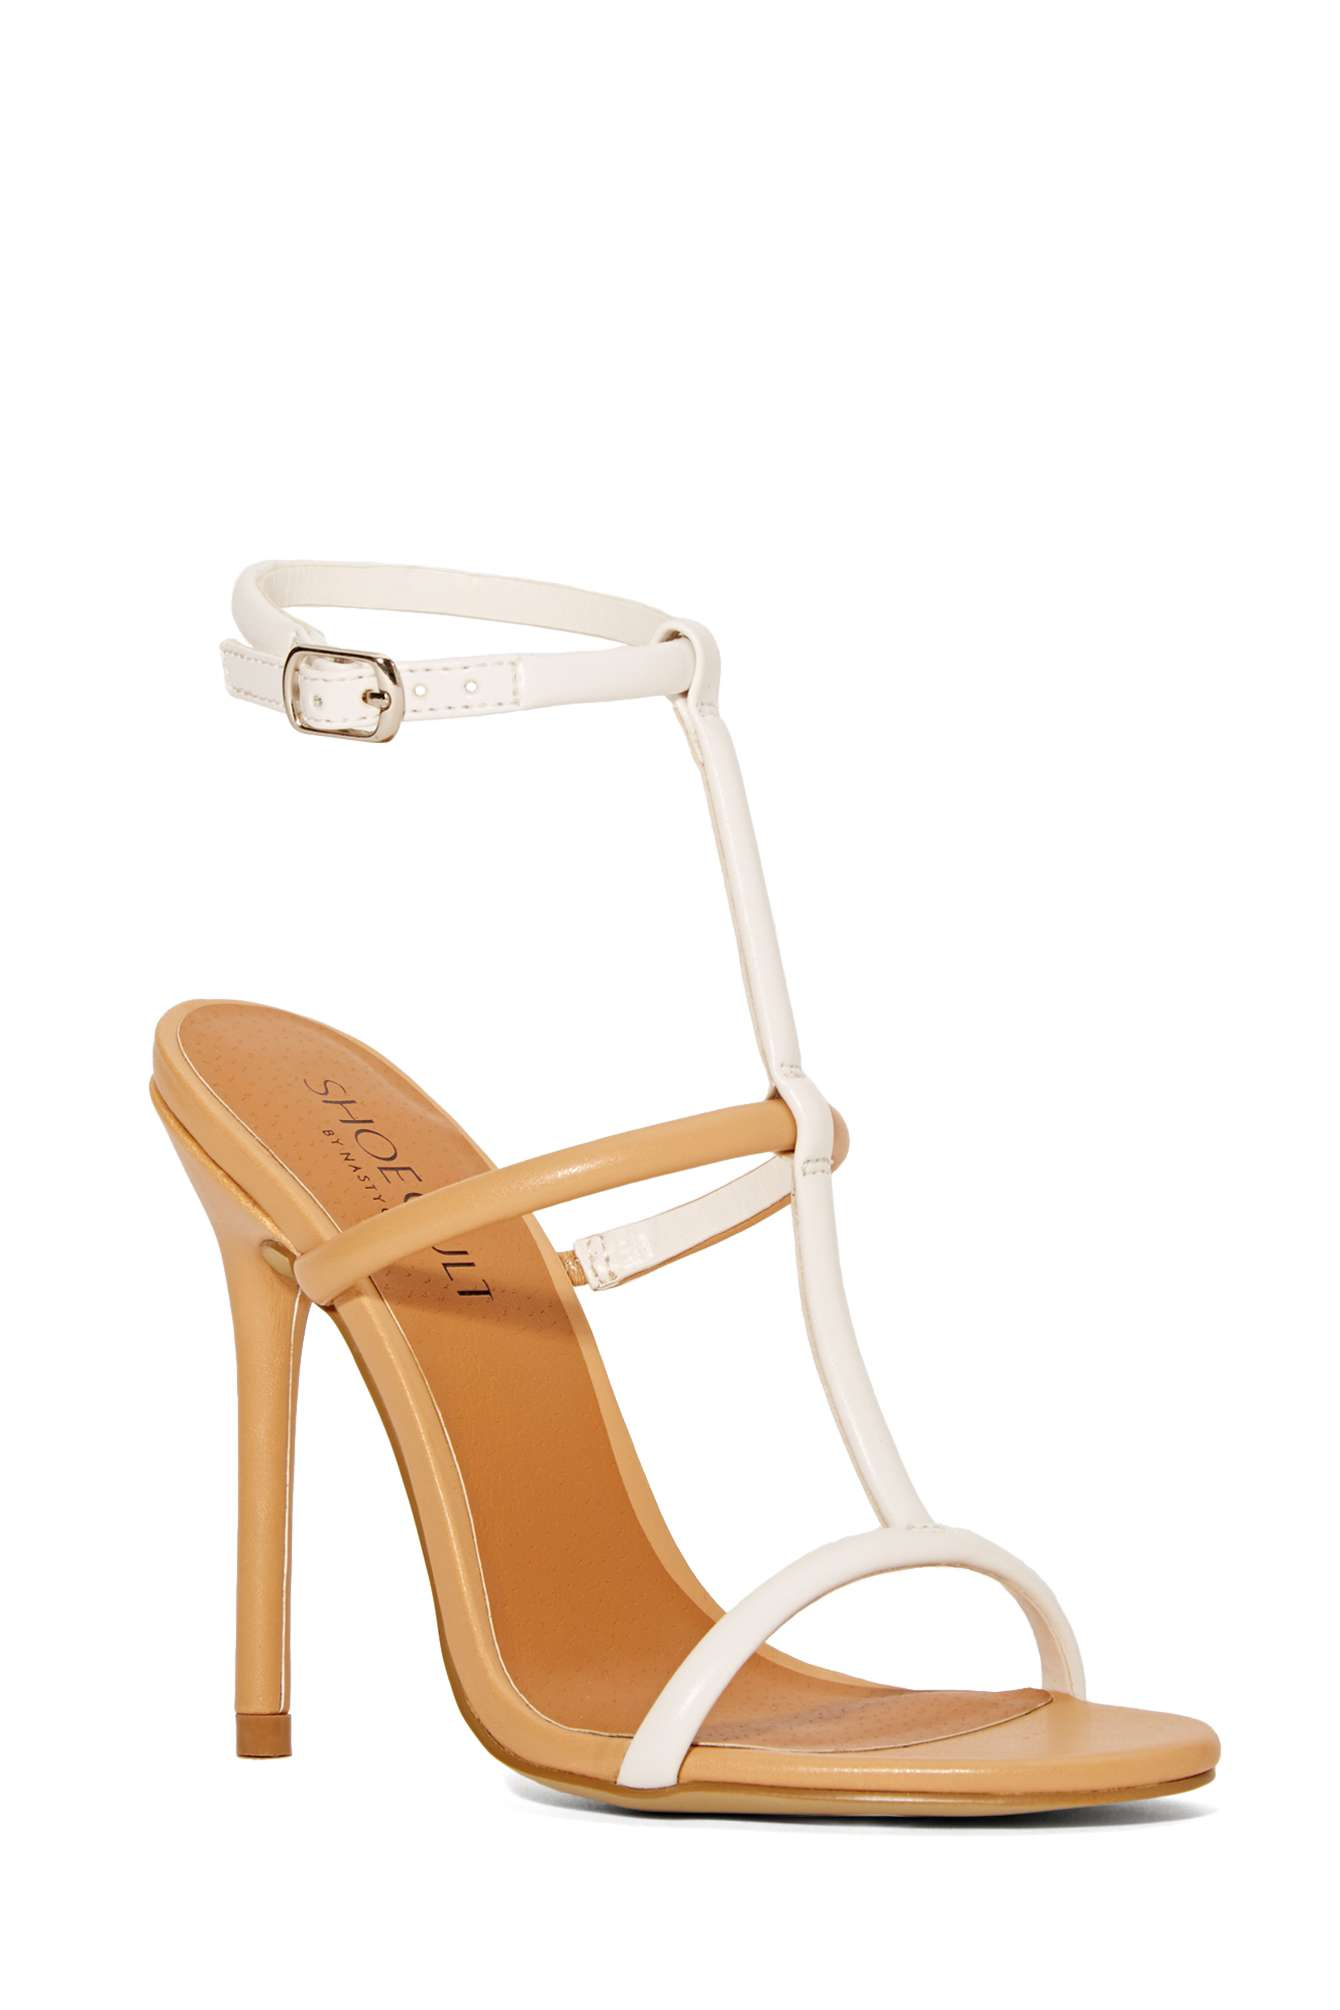 Nasty Gal Shoe Cult Flux Sandal - Nudewhite In Natural  Lyst-6177